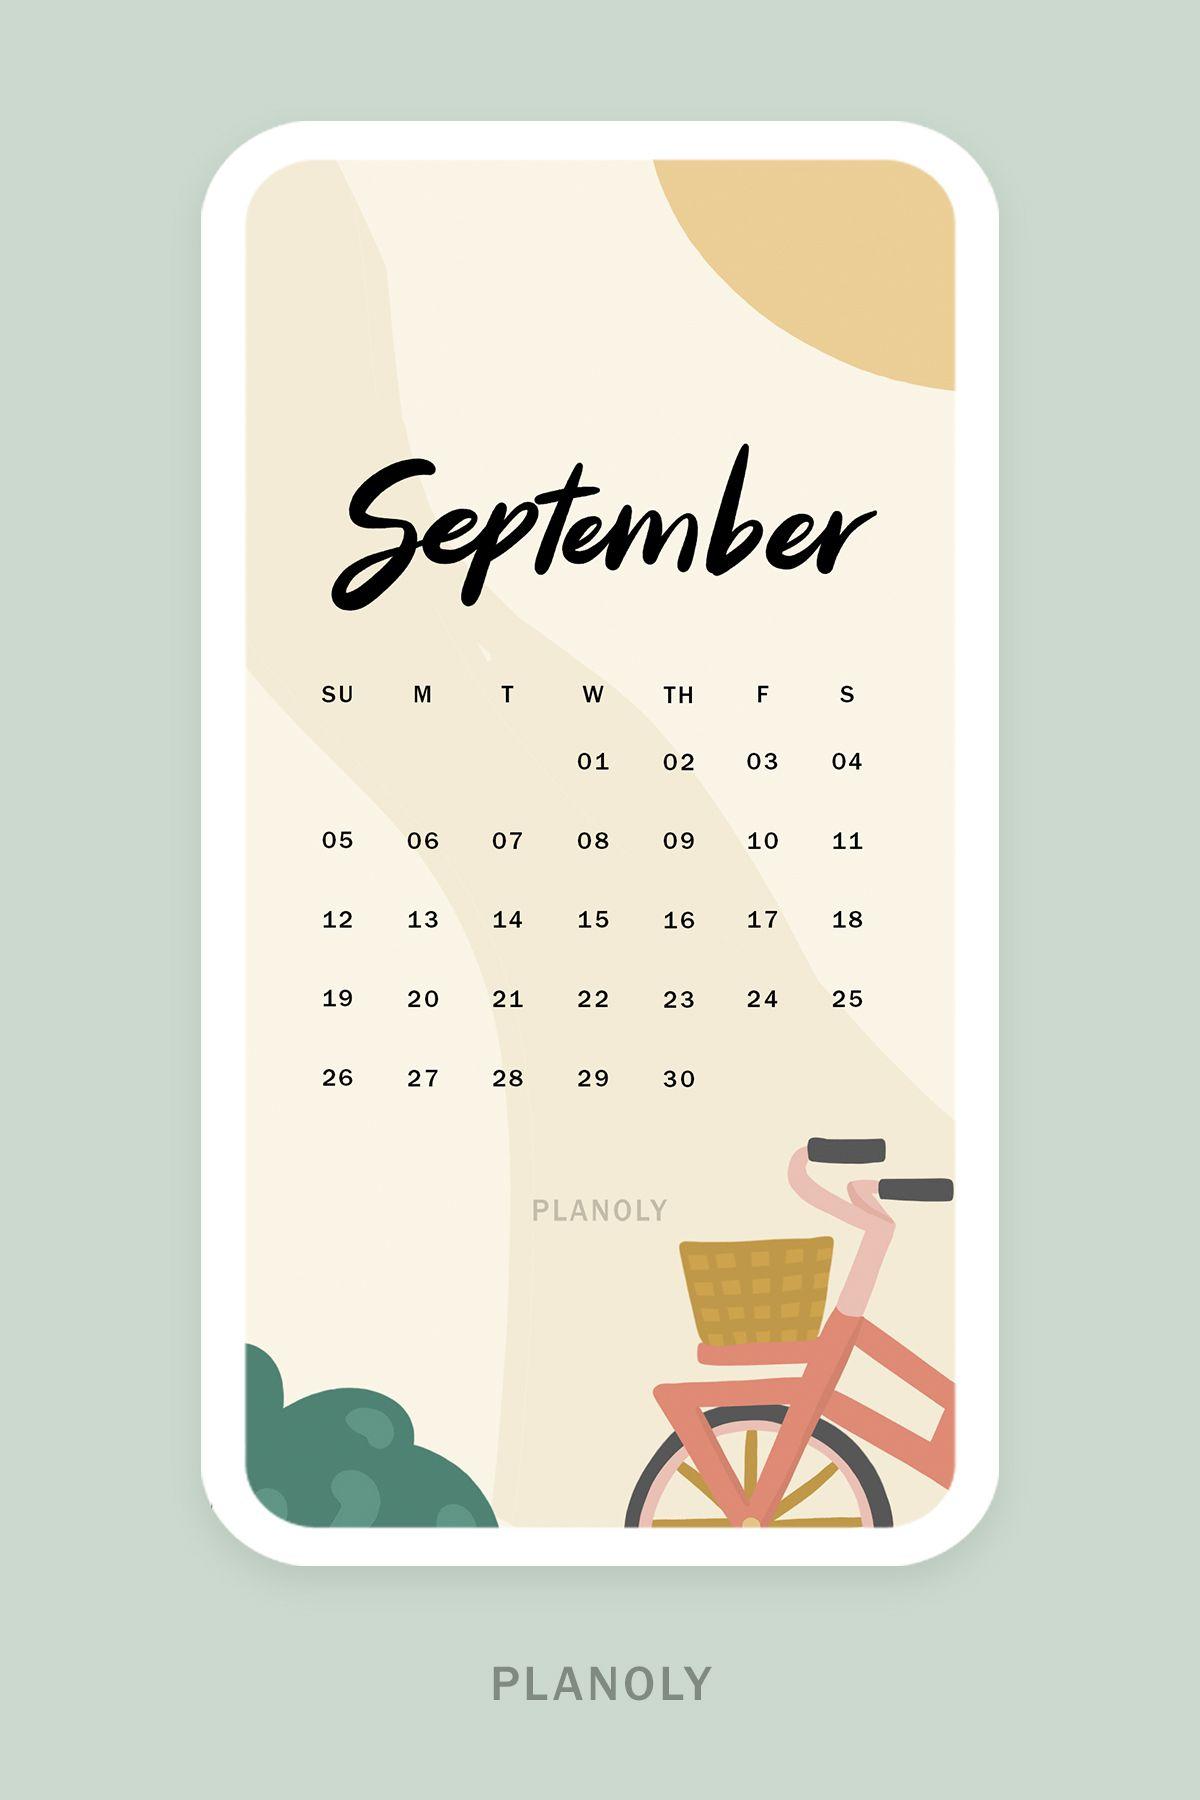 PLANOLY-Blog Post-Q3 Content Calendars-Image 6